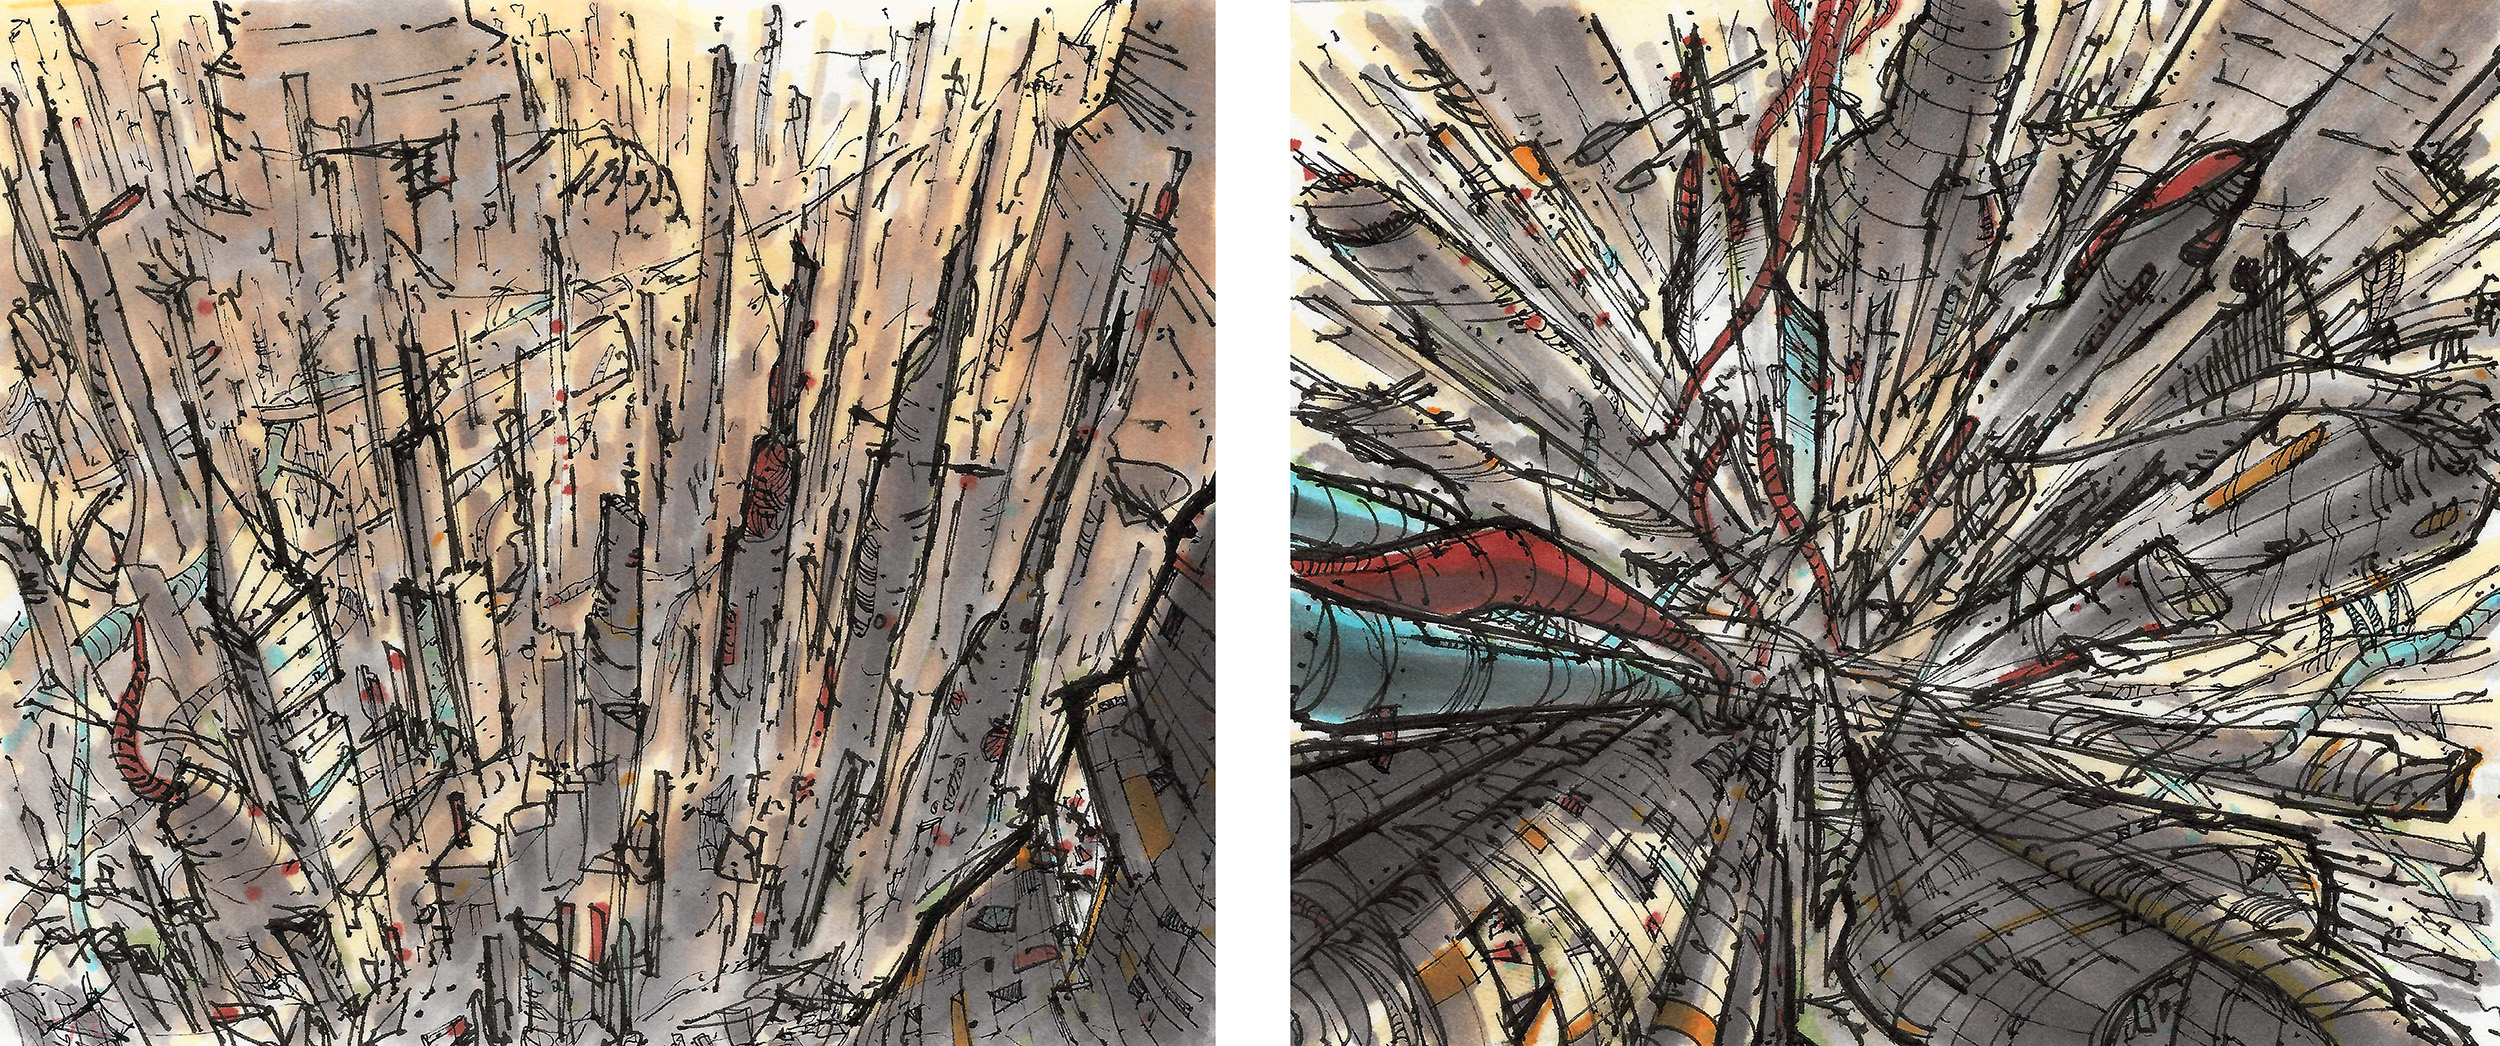 JEREMY RUMAS STORYBOARDS & CONCEPT ART + Skyscrapers + abandoned city + urban decay + NYC storyboard artist + marker art + www.jeremyrumas.com.jpg